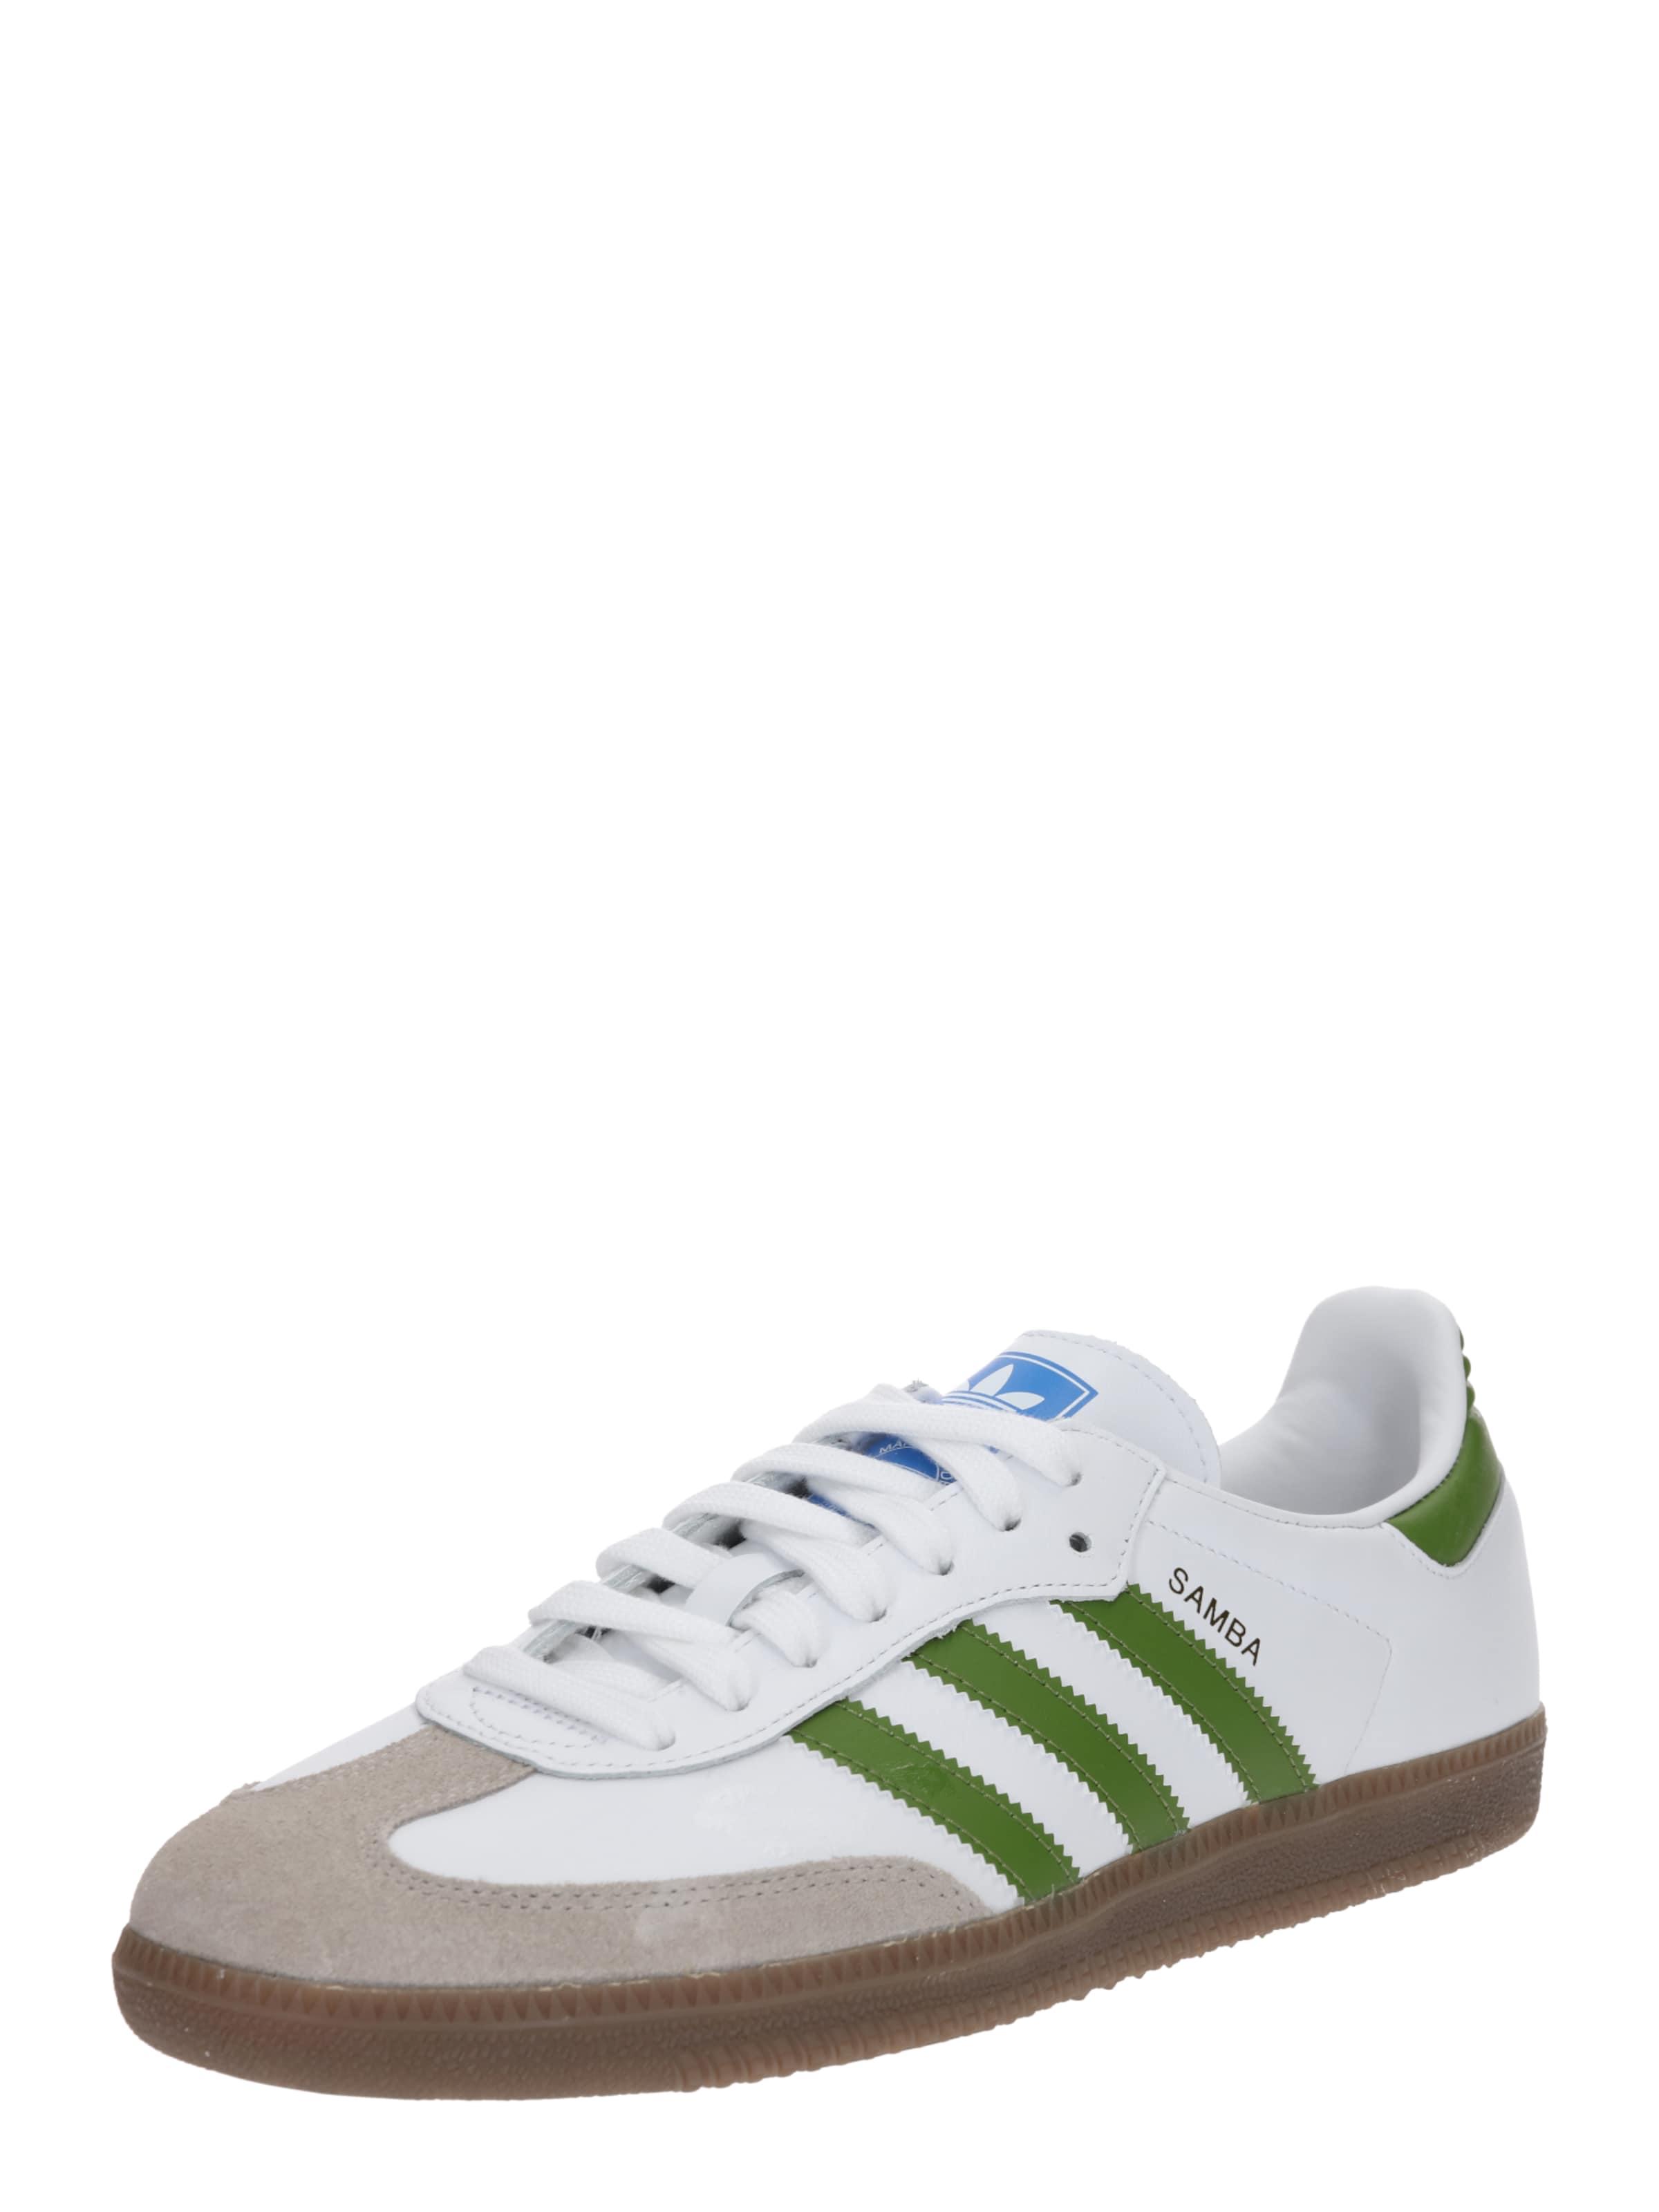 Adidas OlivWeiß Sneaker Og' In Originals 'samba TlJF1Kc